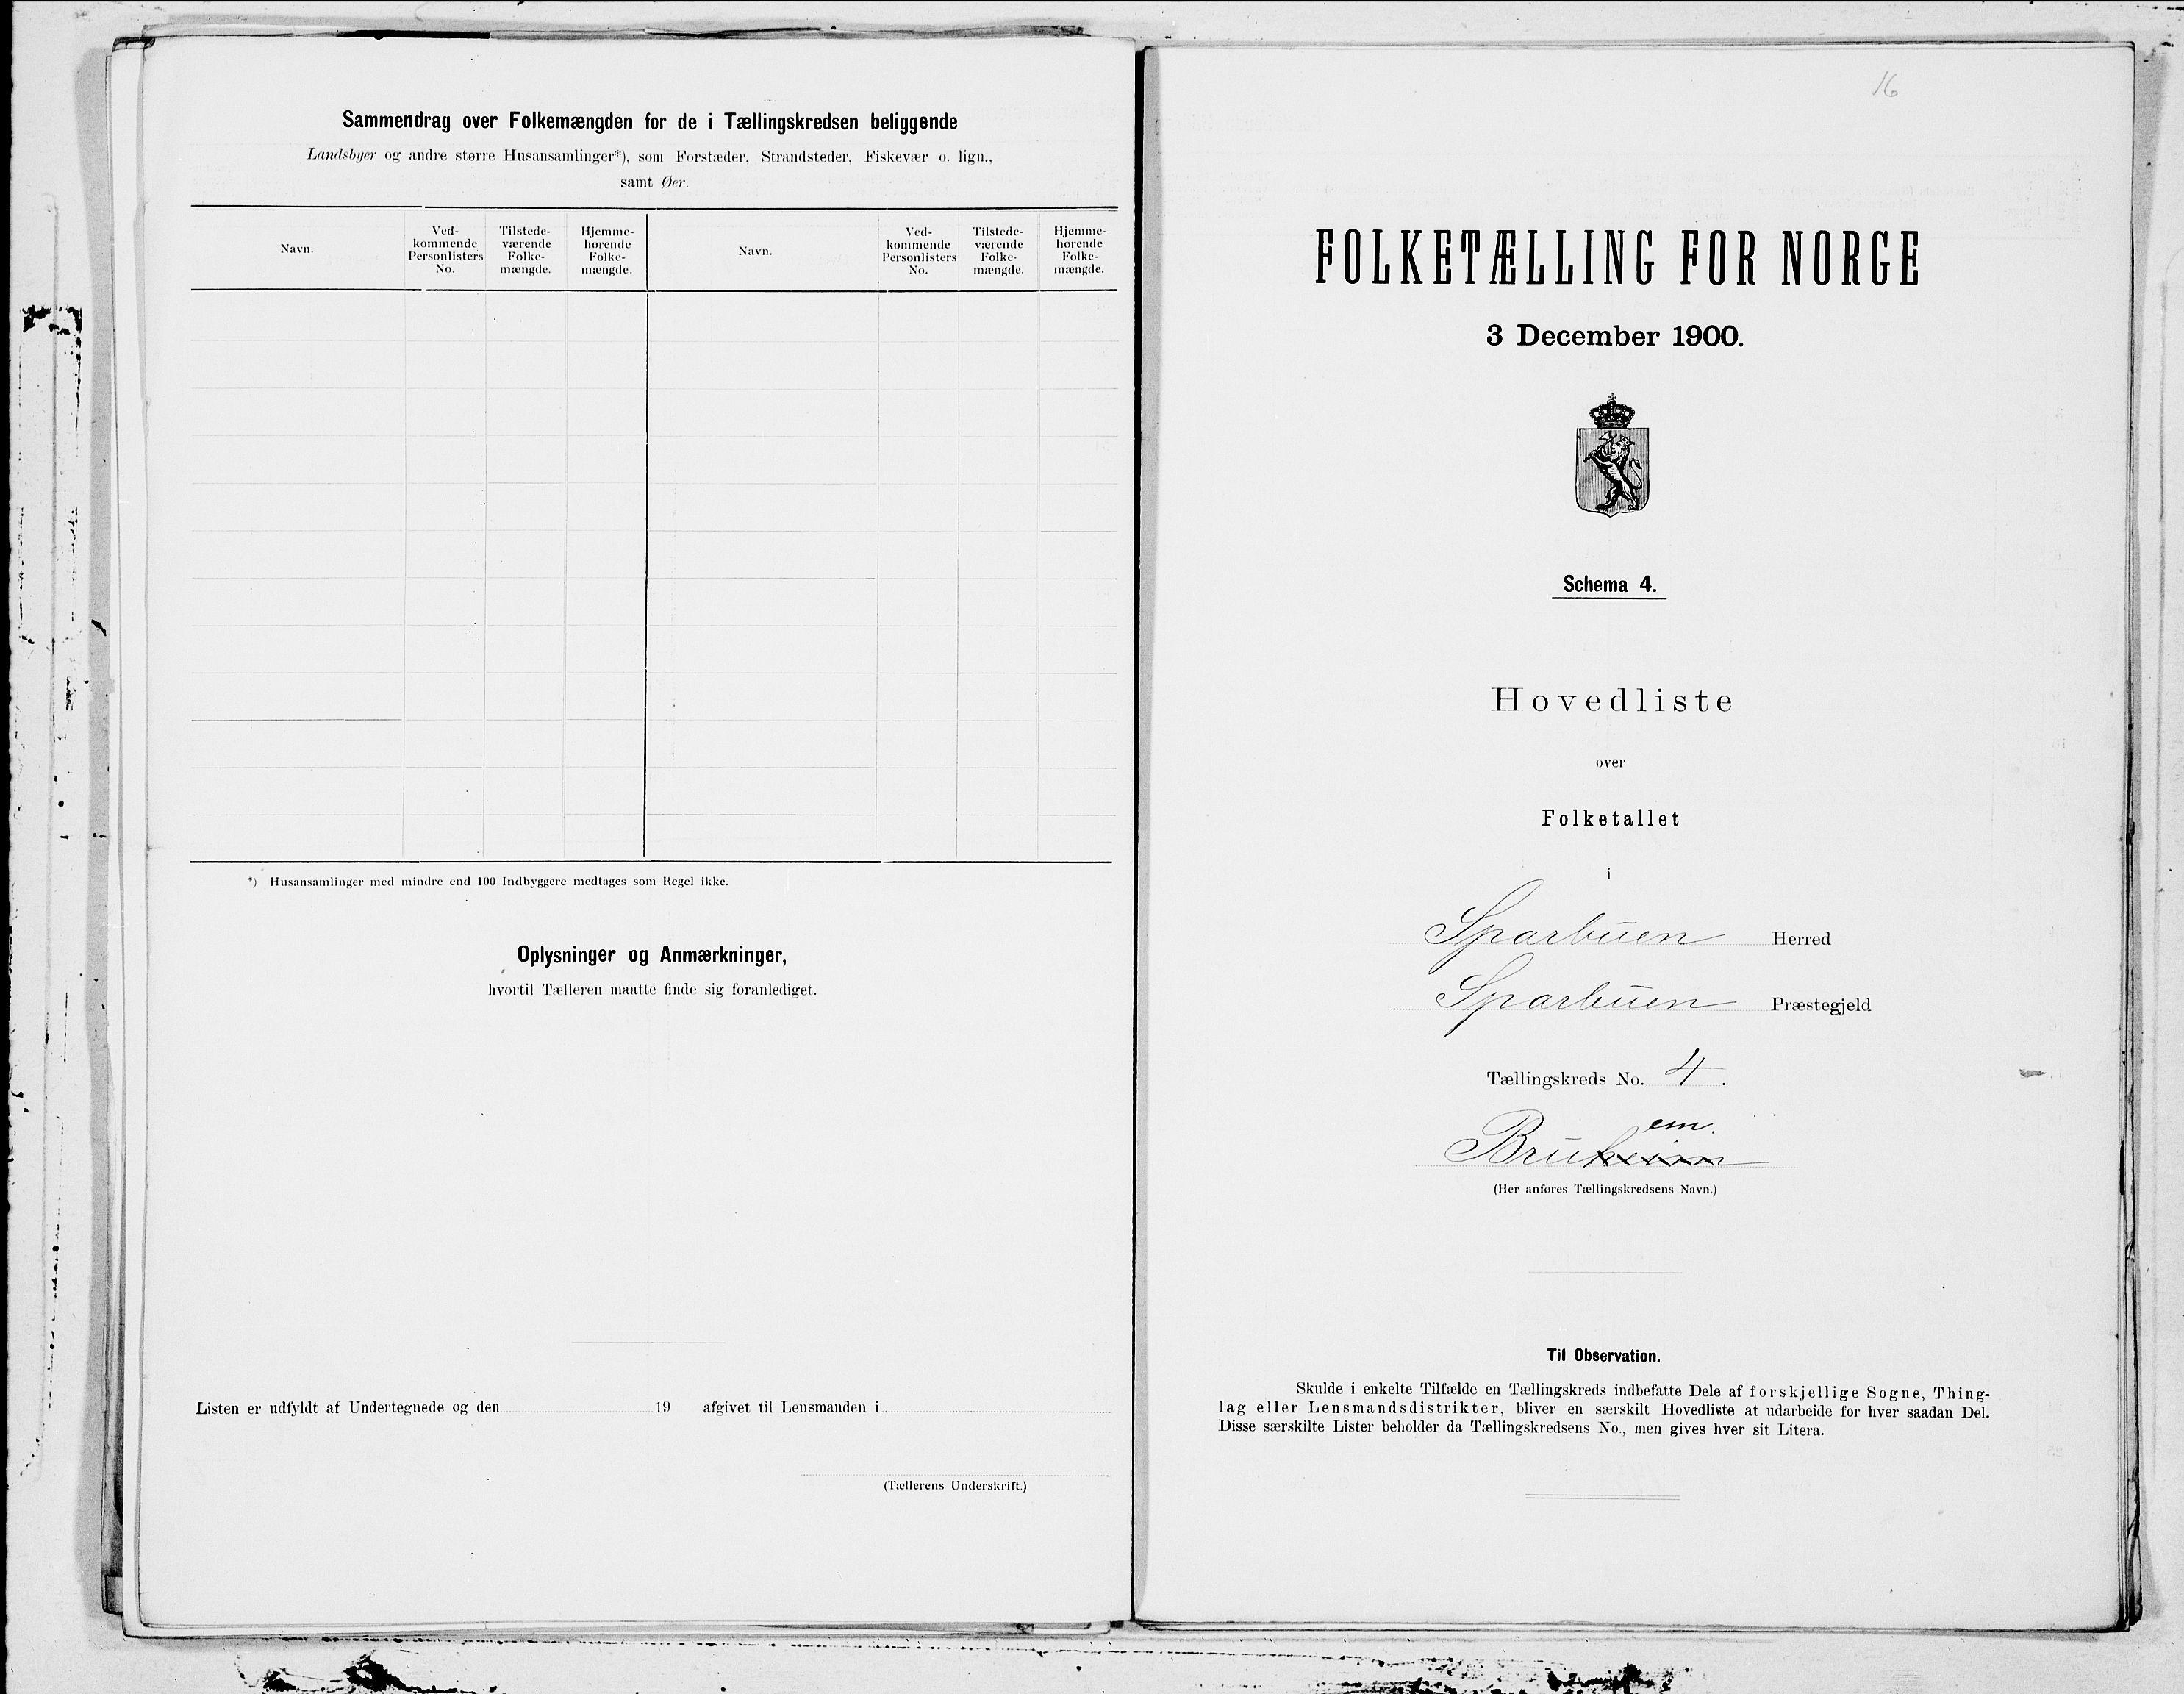 SAT, Folketelling 1900 for 1731 Sparbu herred, 1900, s. 10